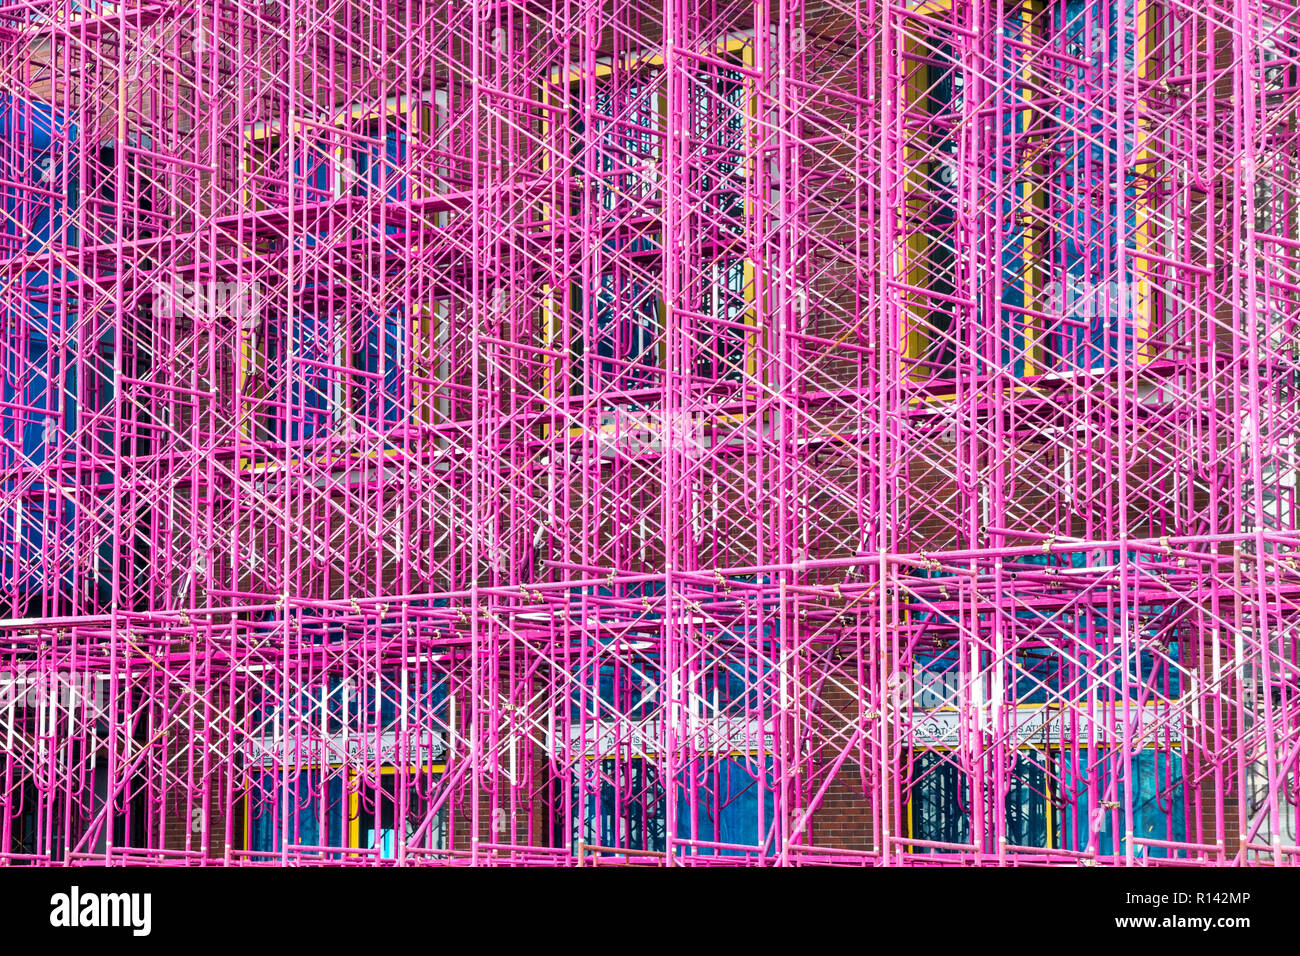 Pink scaffolding, Bangkok, Thailand - Stock Image